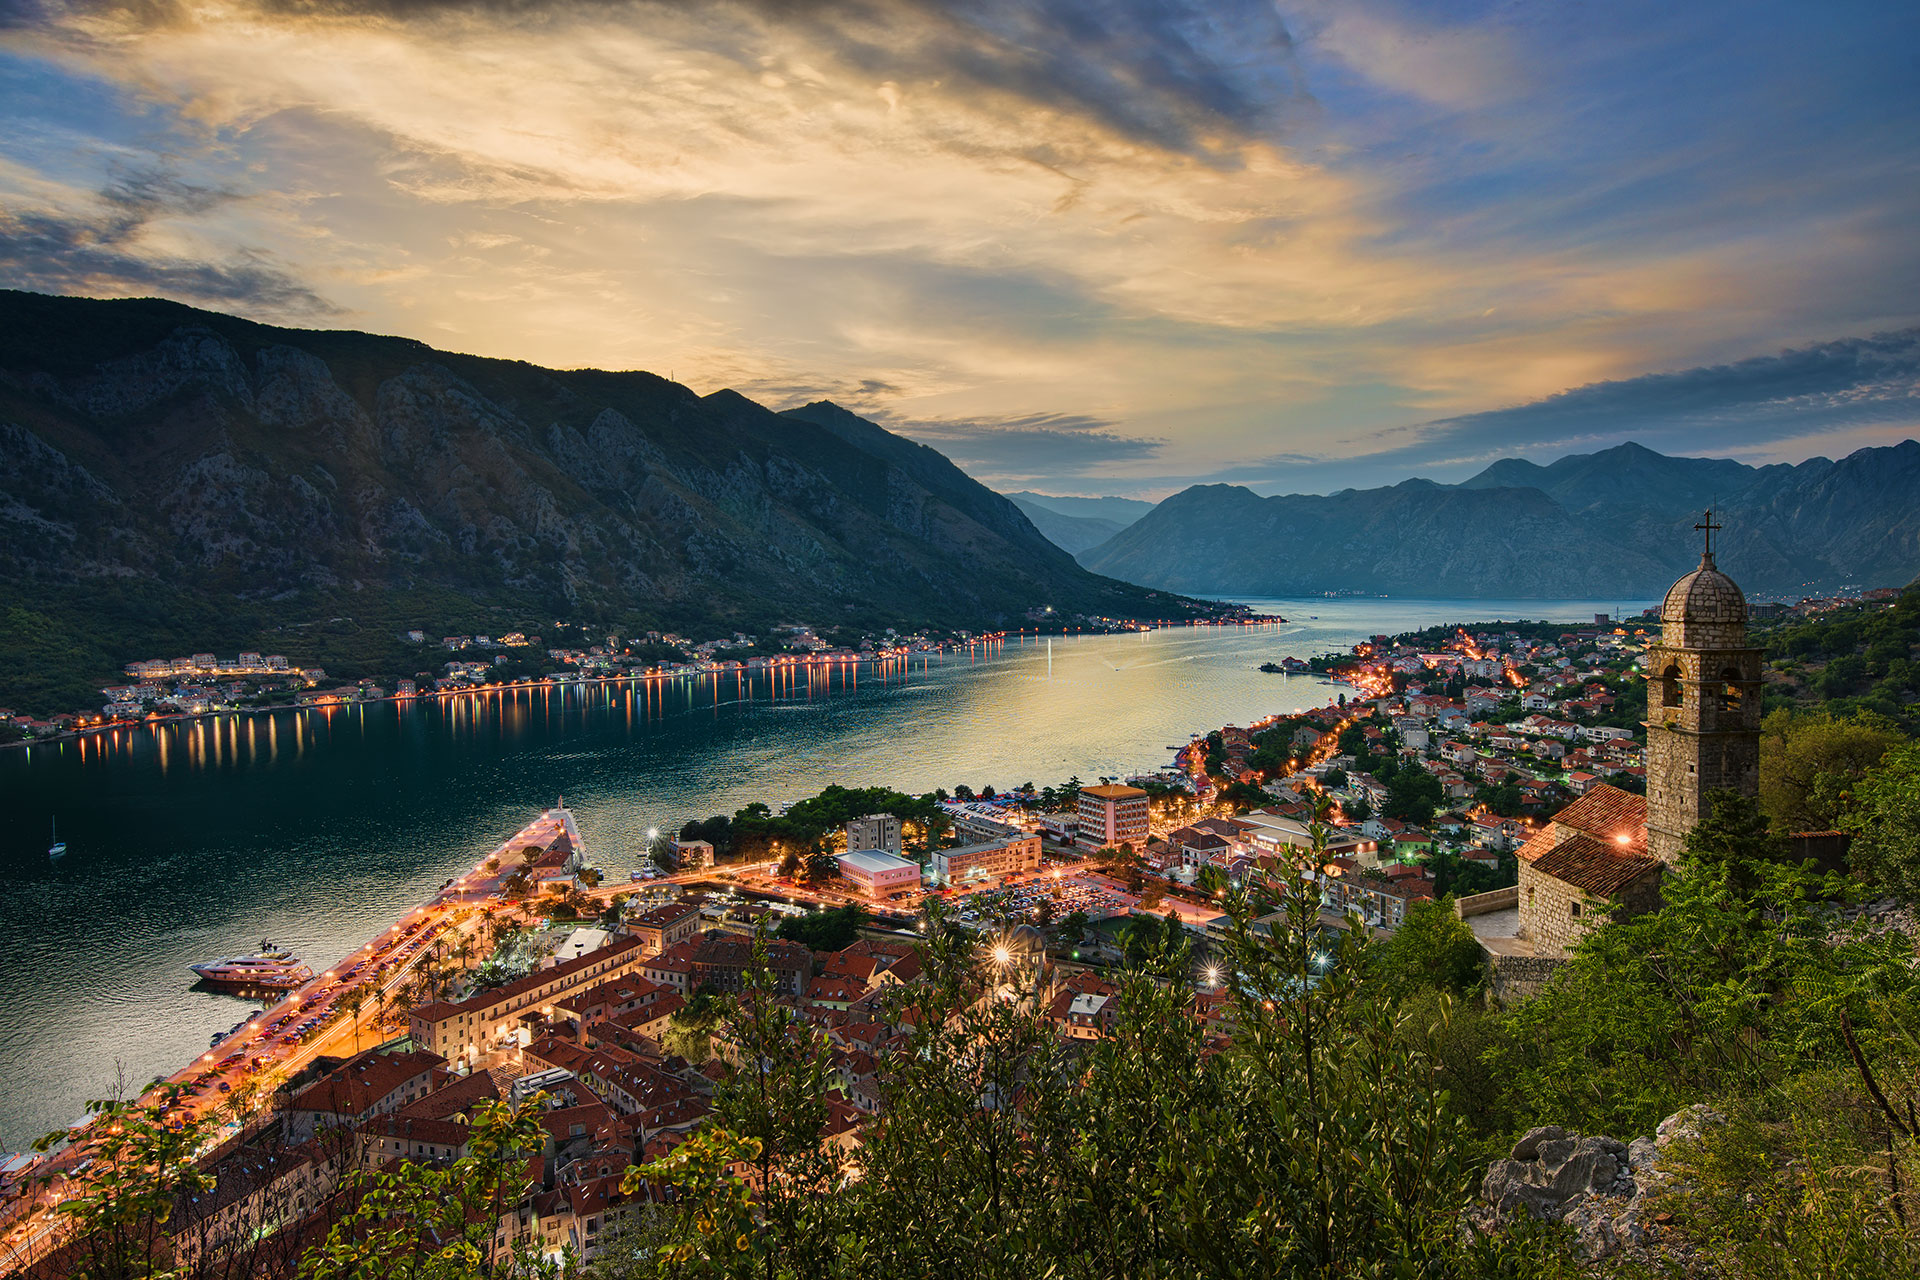 Montenegro; Courtesy of AleksandrLu/Shutterstock.com